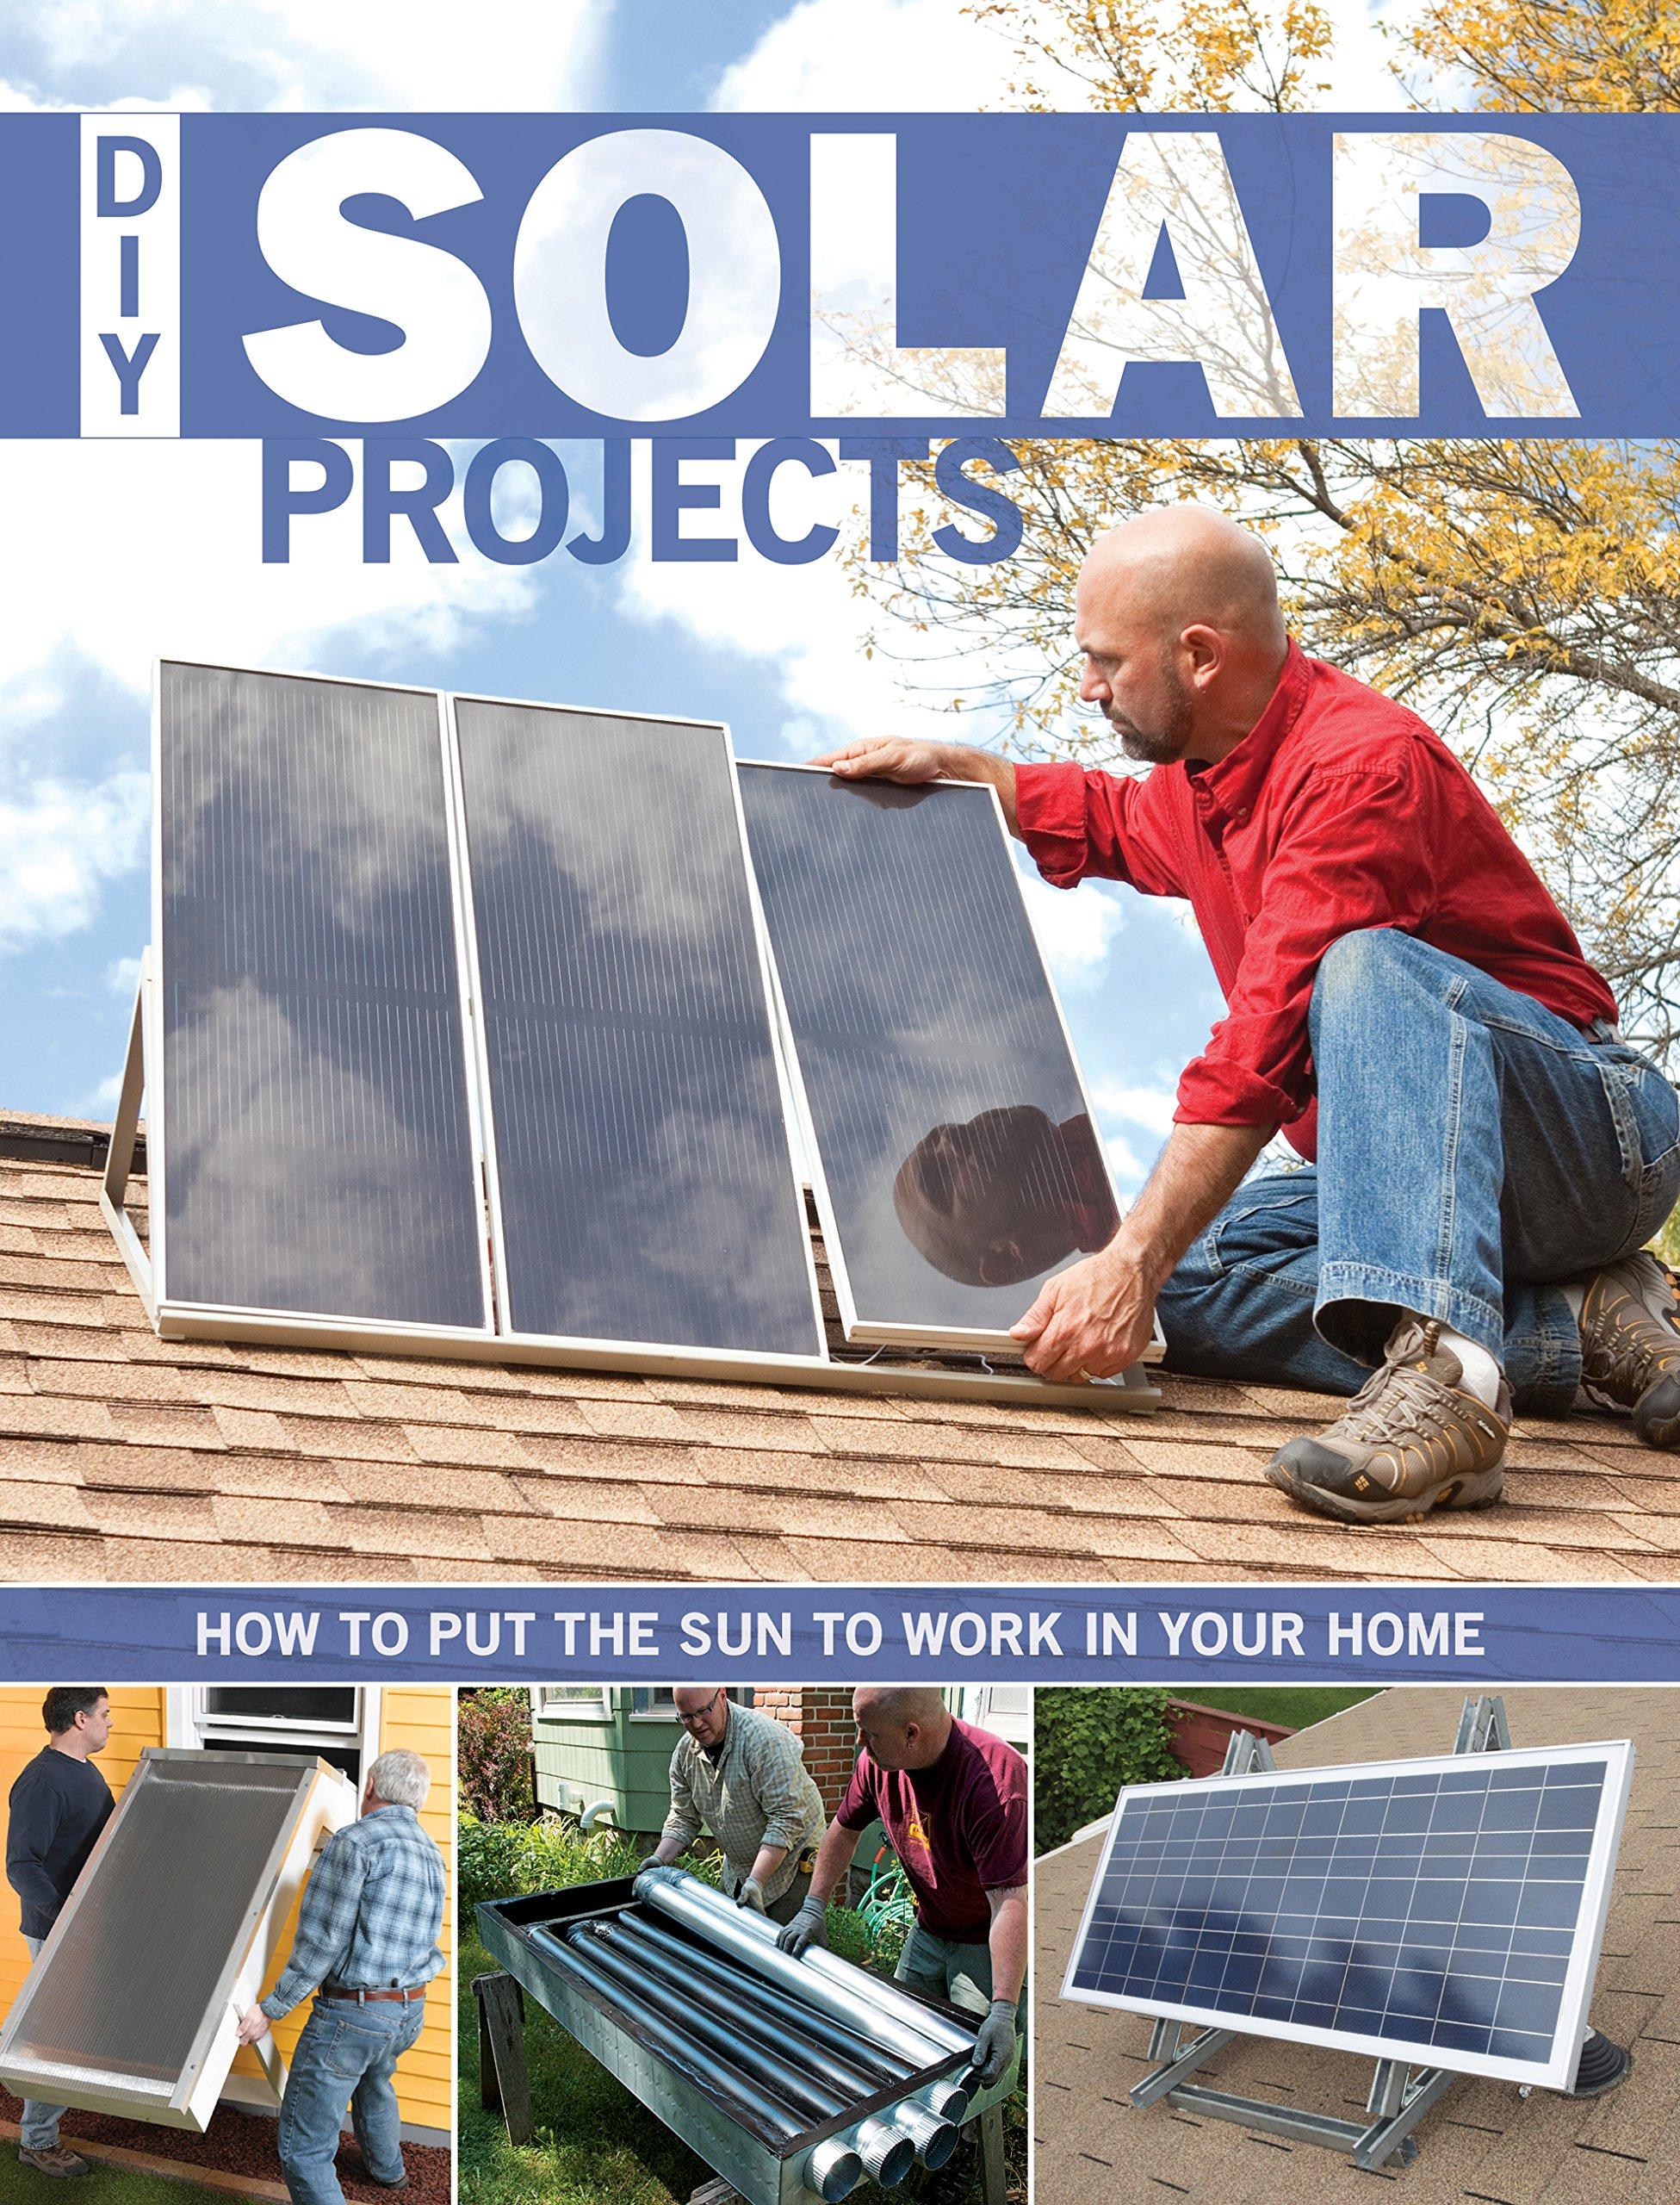 Diy solar projects eric smith 8601420497863 amazon books solutioingenieria Images